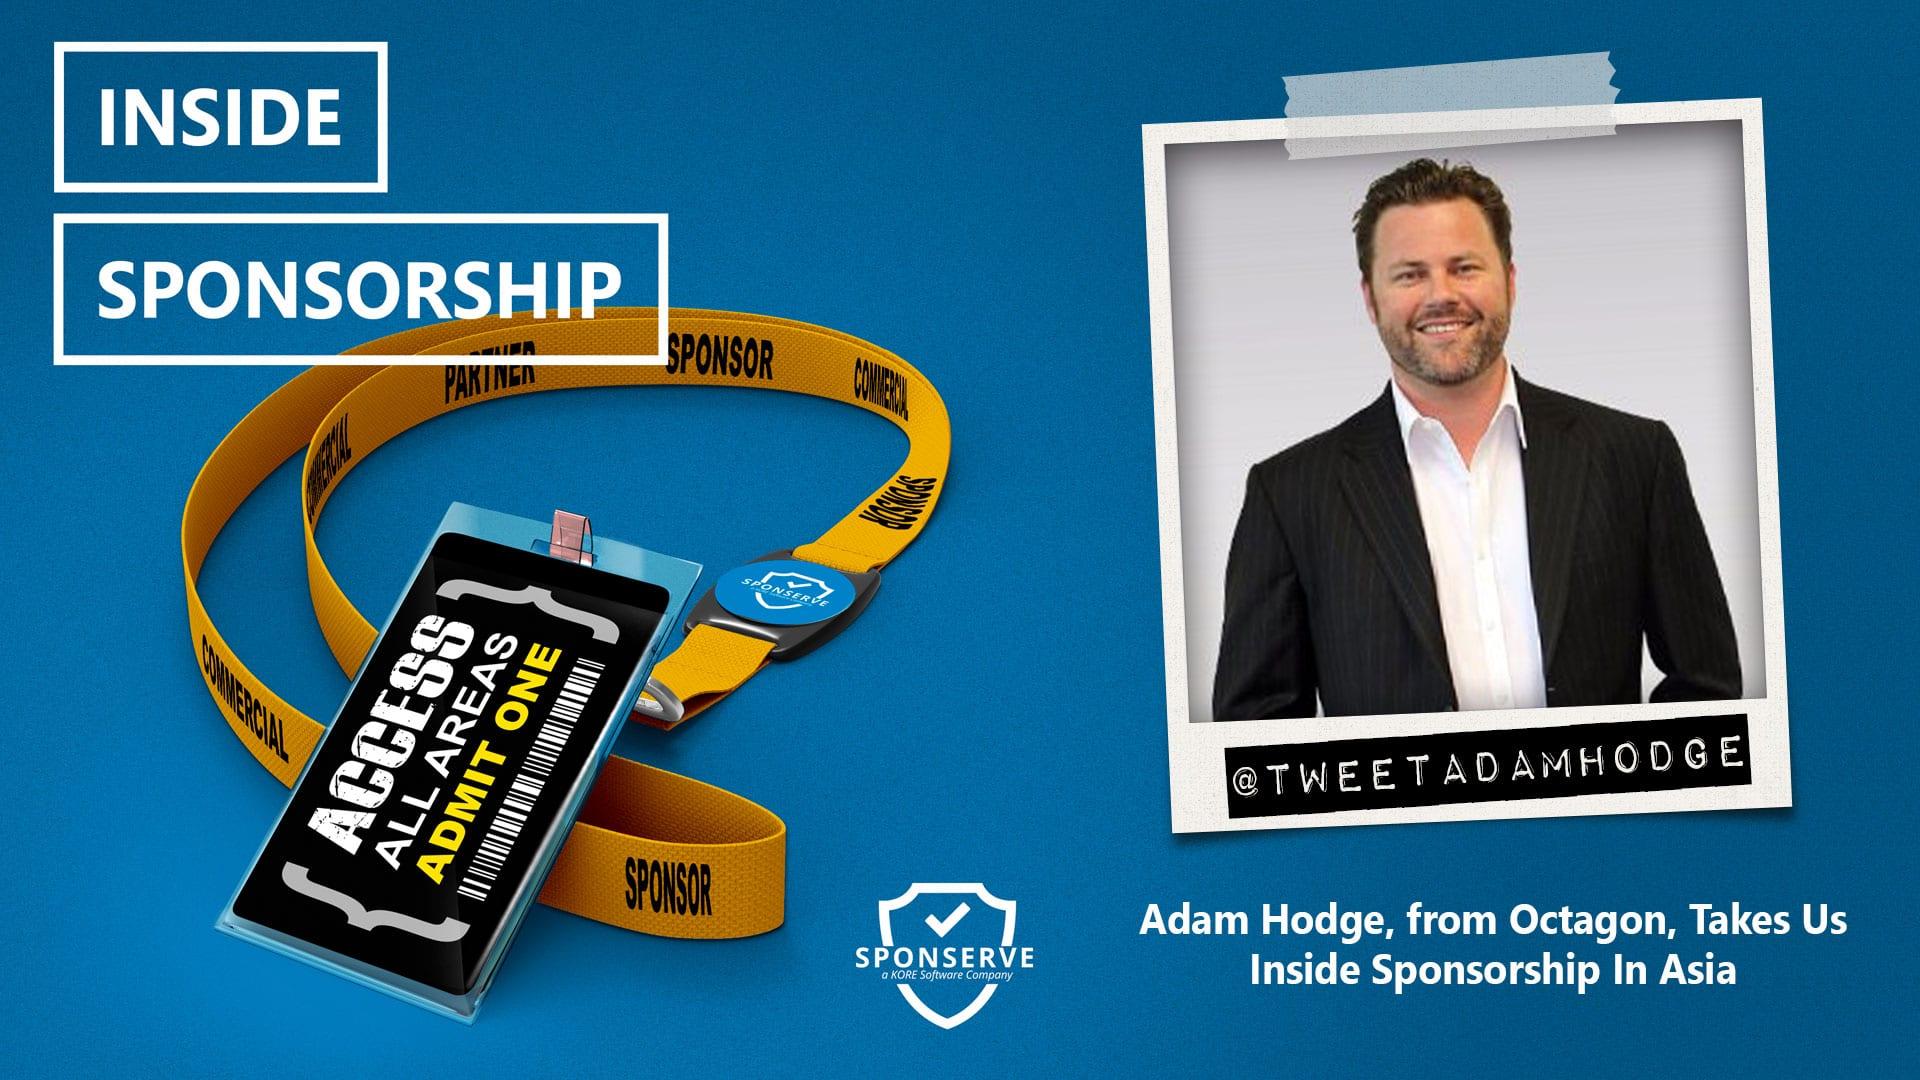 Inside-Sponsorship-Adam-Hodge-Octagon-Sponsorship-in-Asia-Ep-66